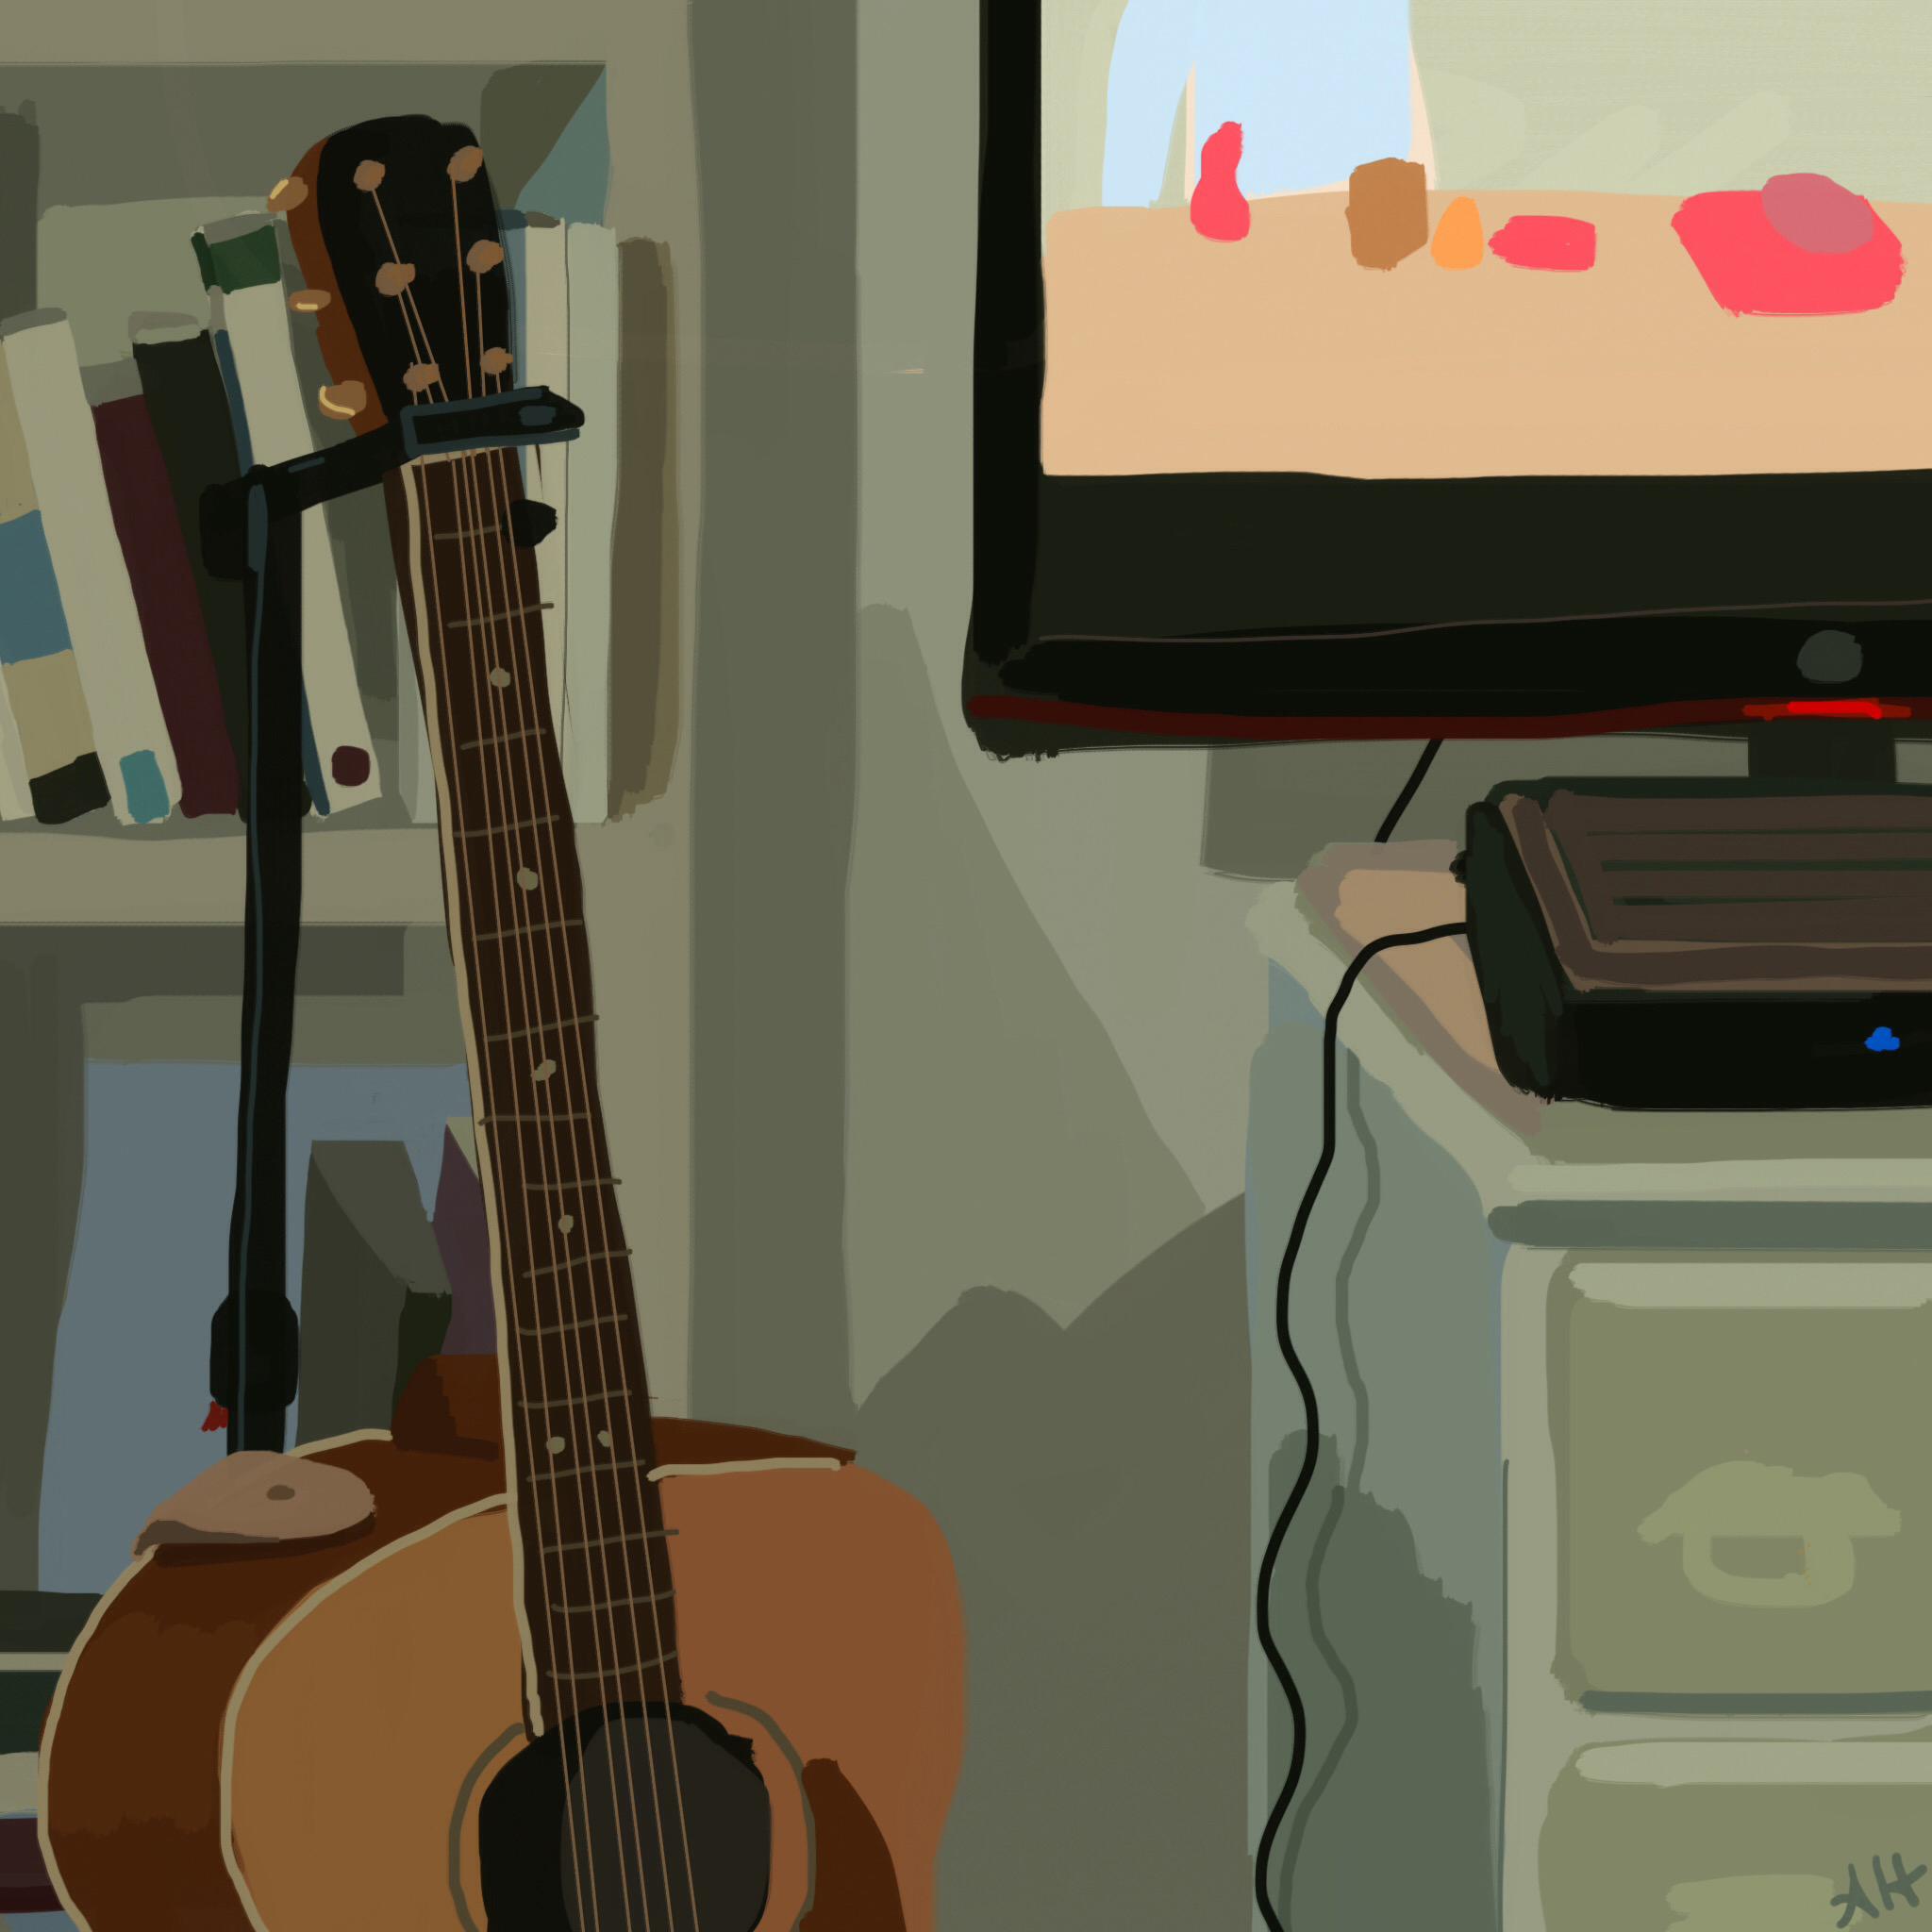 a digital sketch of a corner of my bedroom by alleanna harris